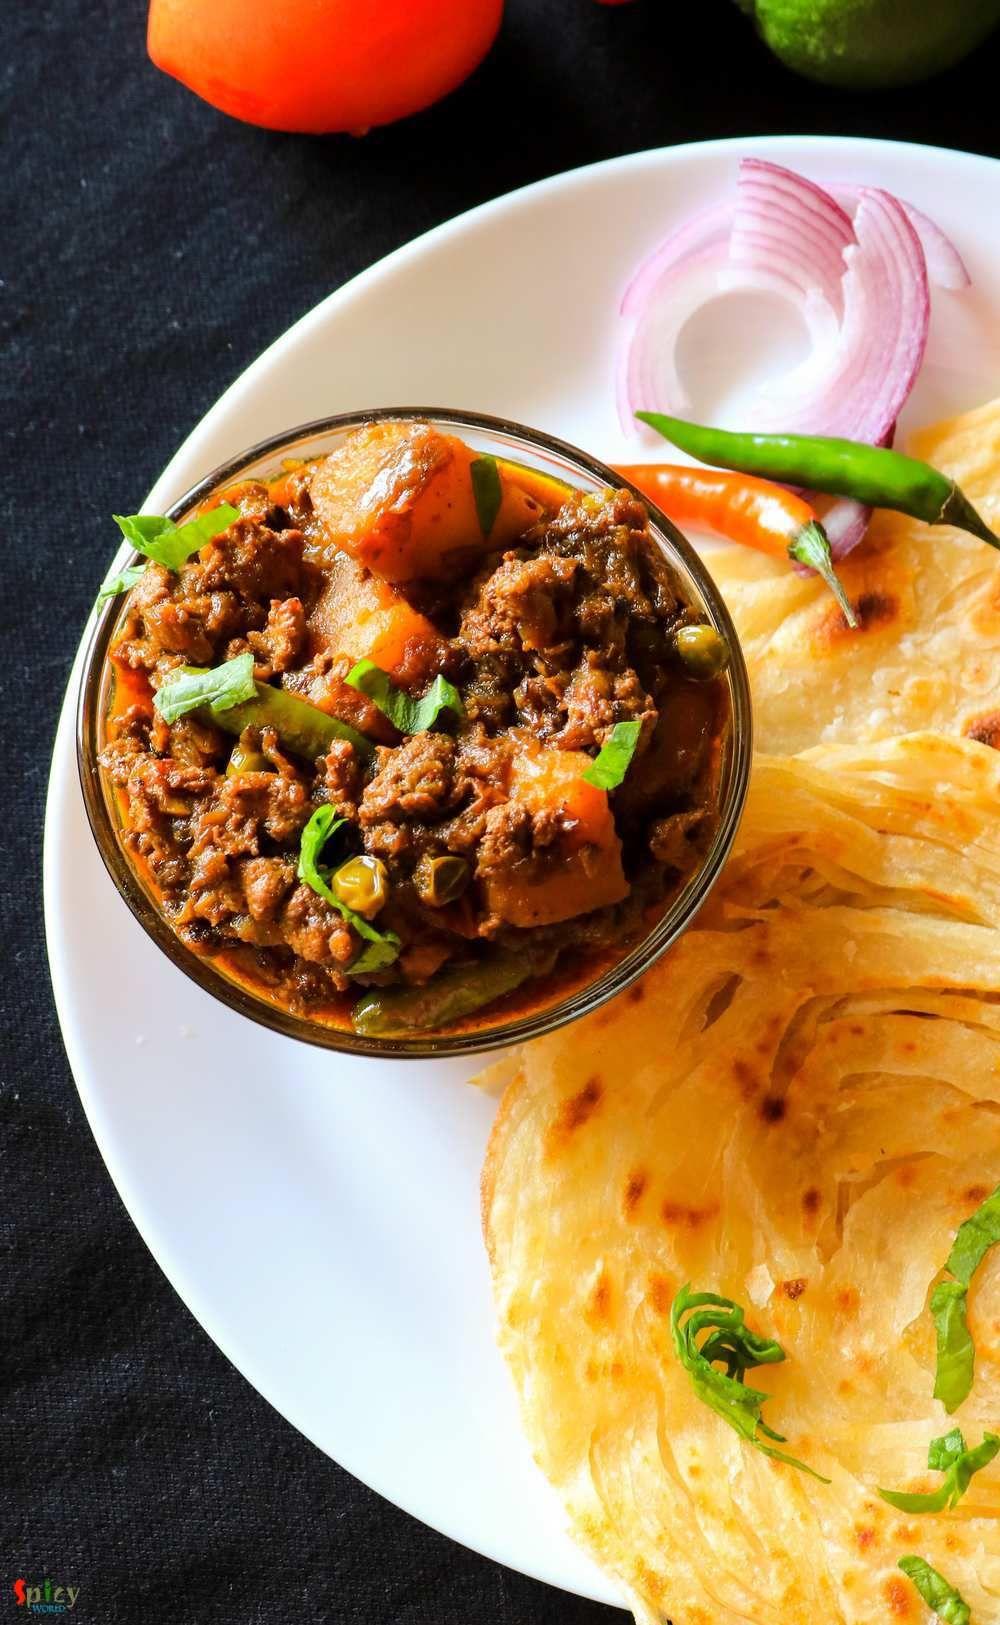 Keema Aloo / Minced Mutton Curry with Potatoes